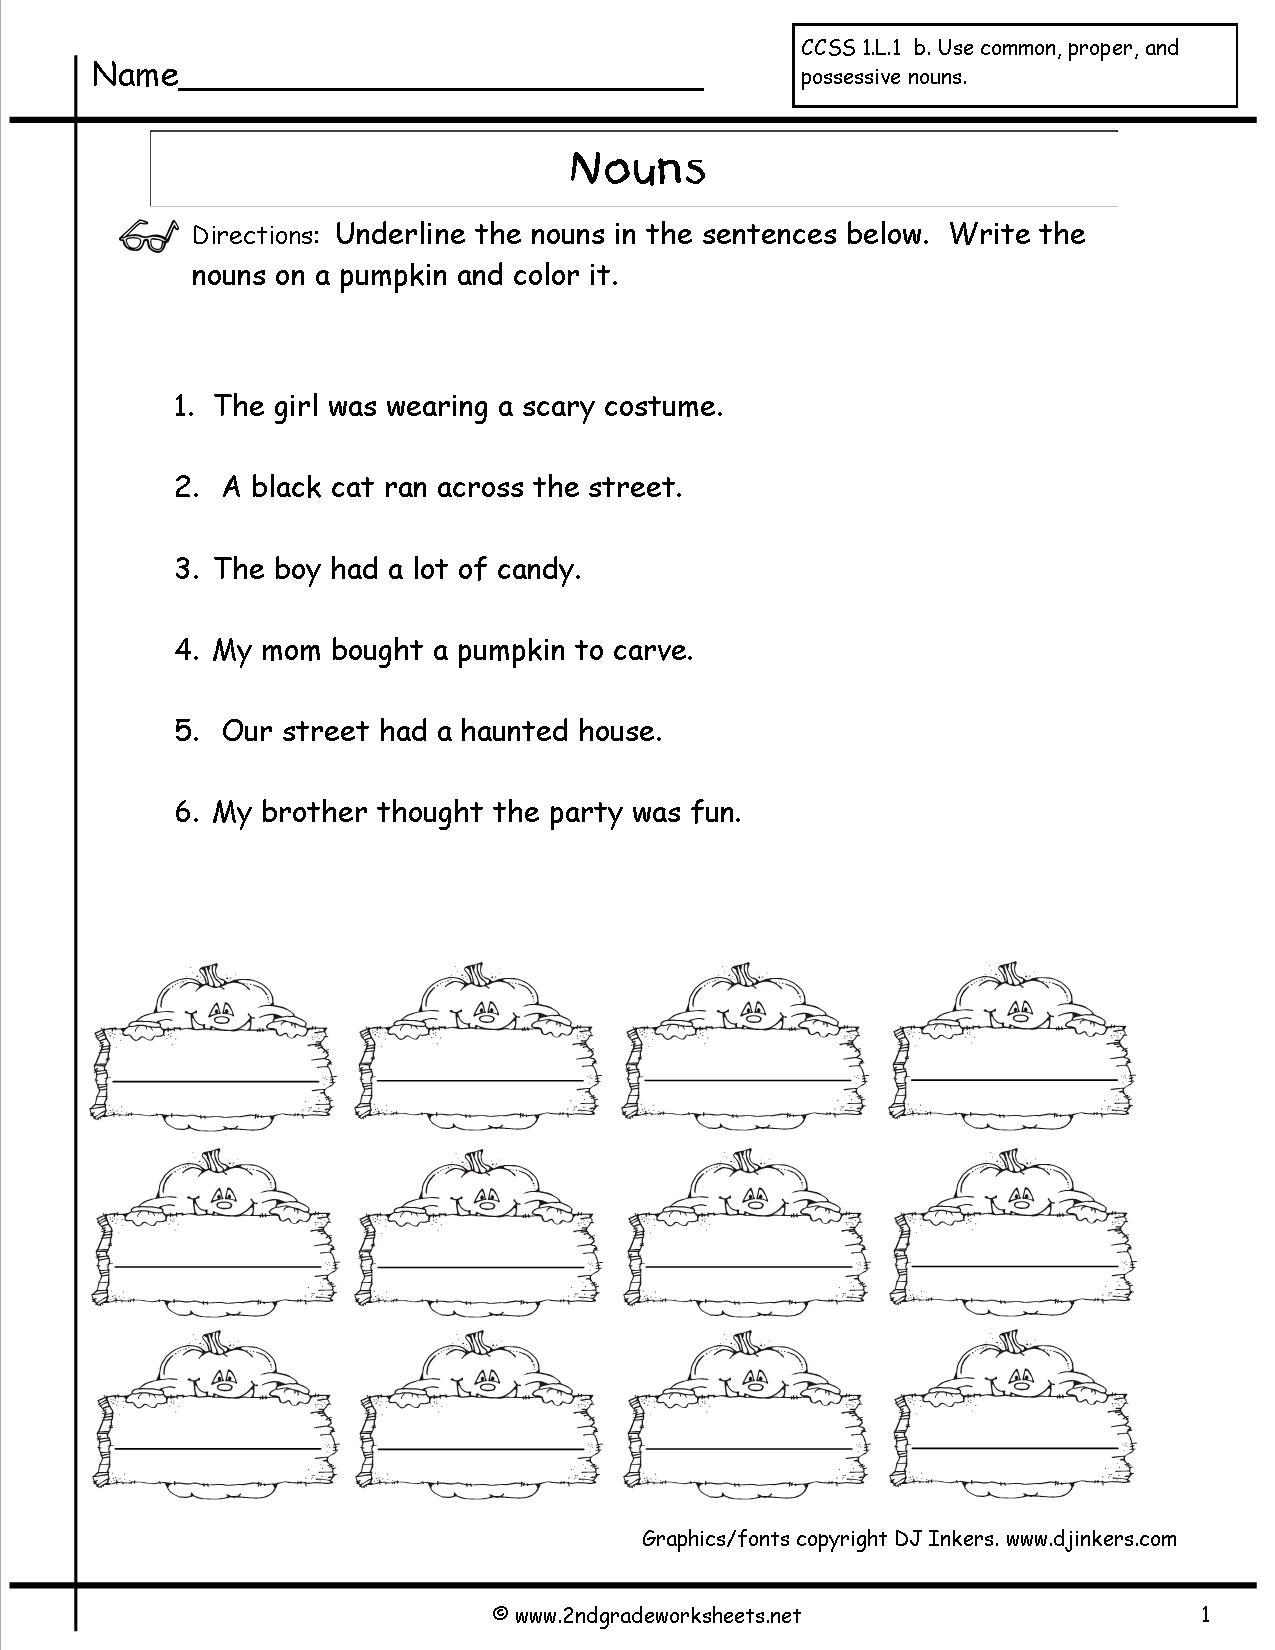 Nouns Worksheets And Printouts | Free Printable Verb Worksheets